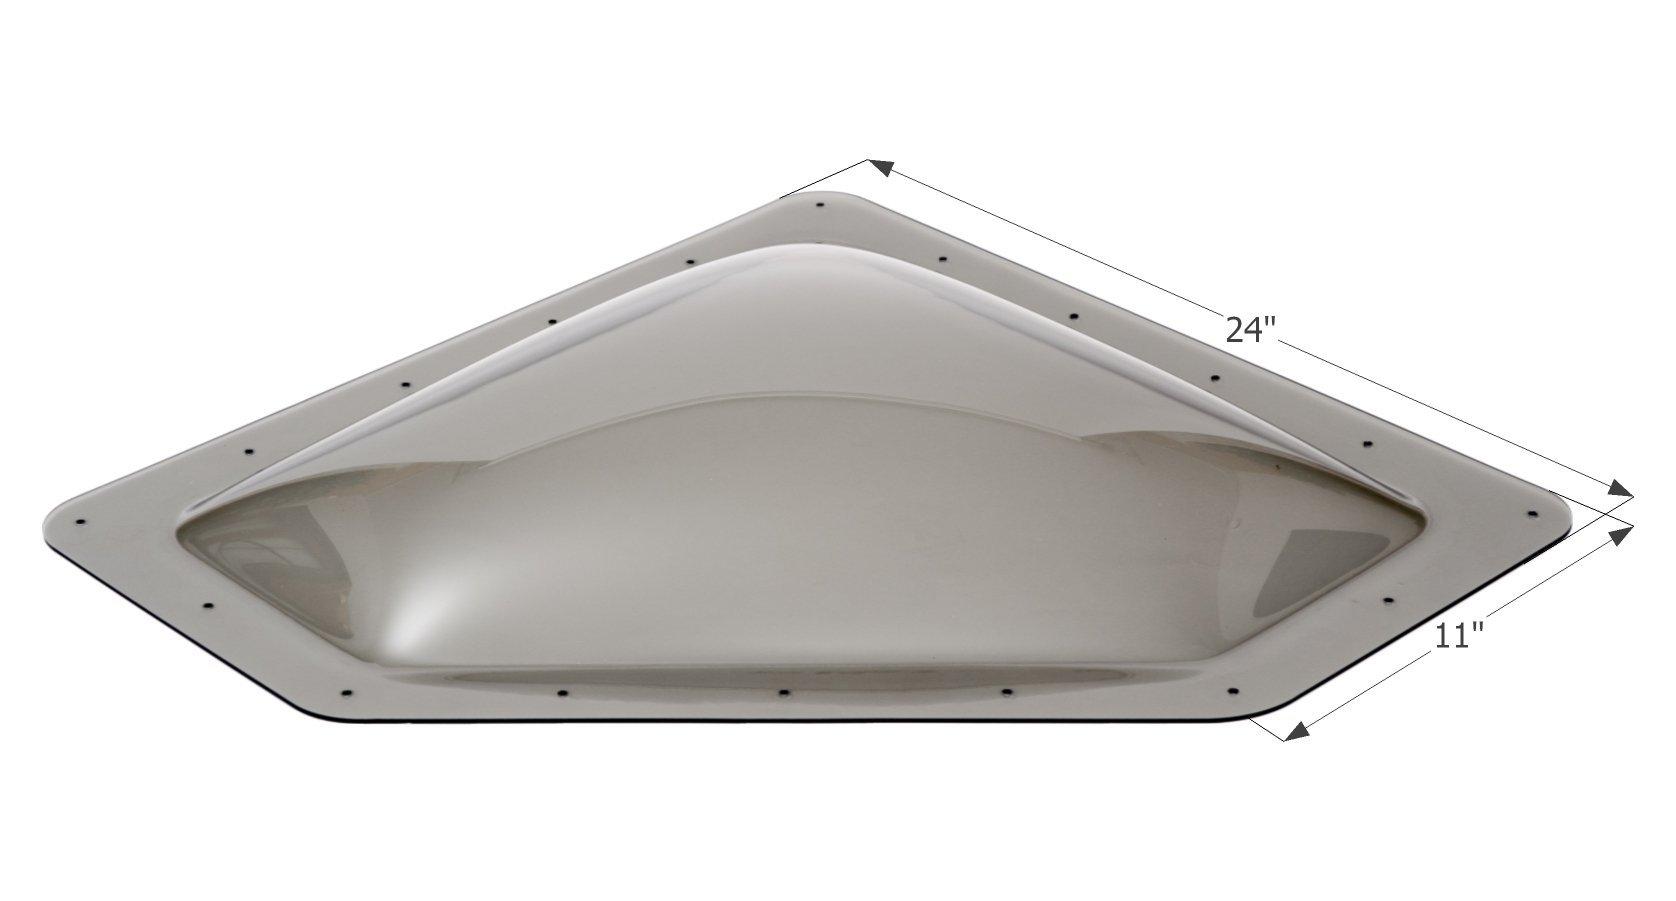 ICON 12114 RV Skylight